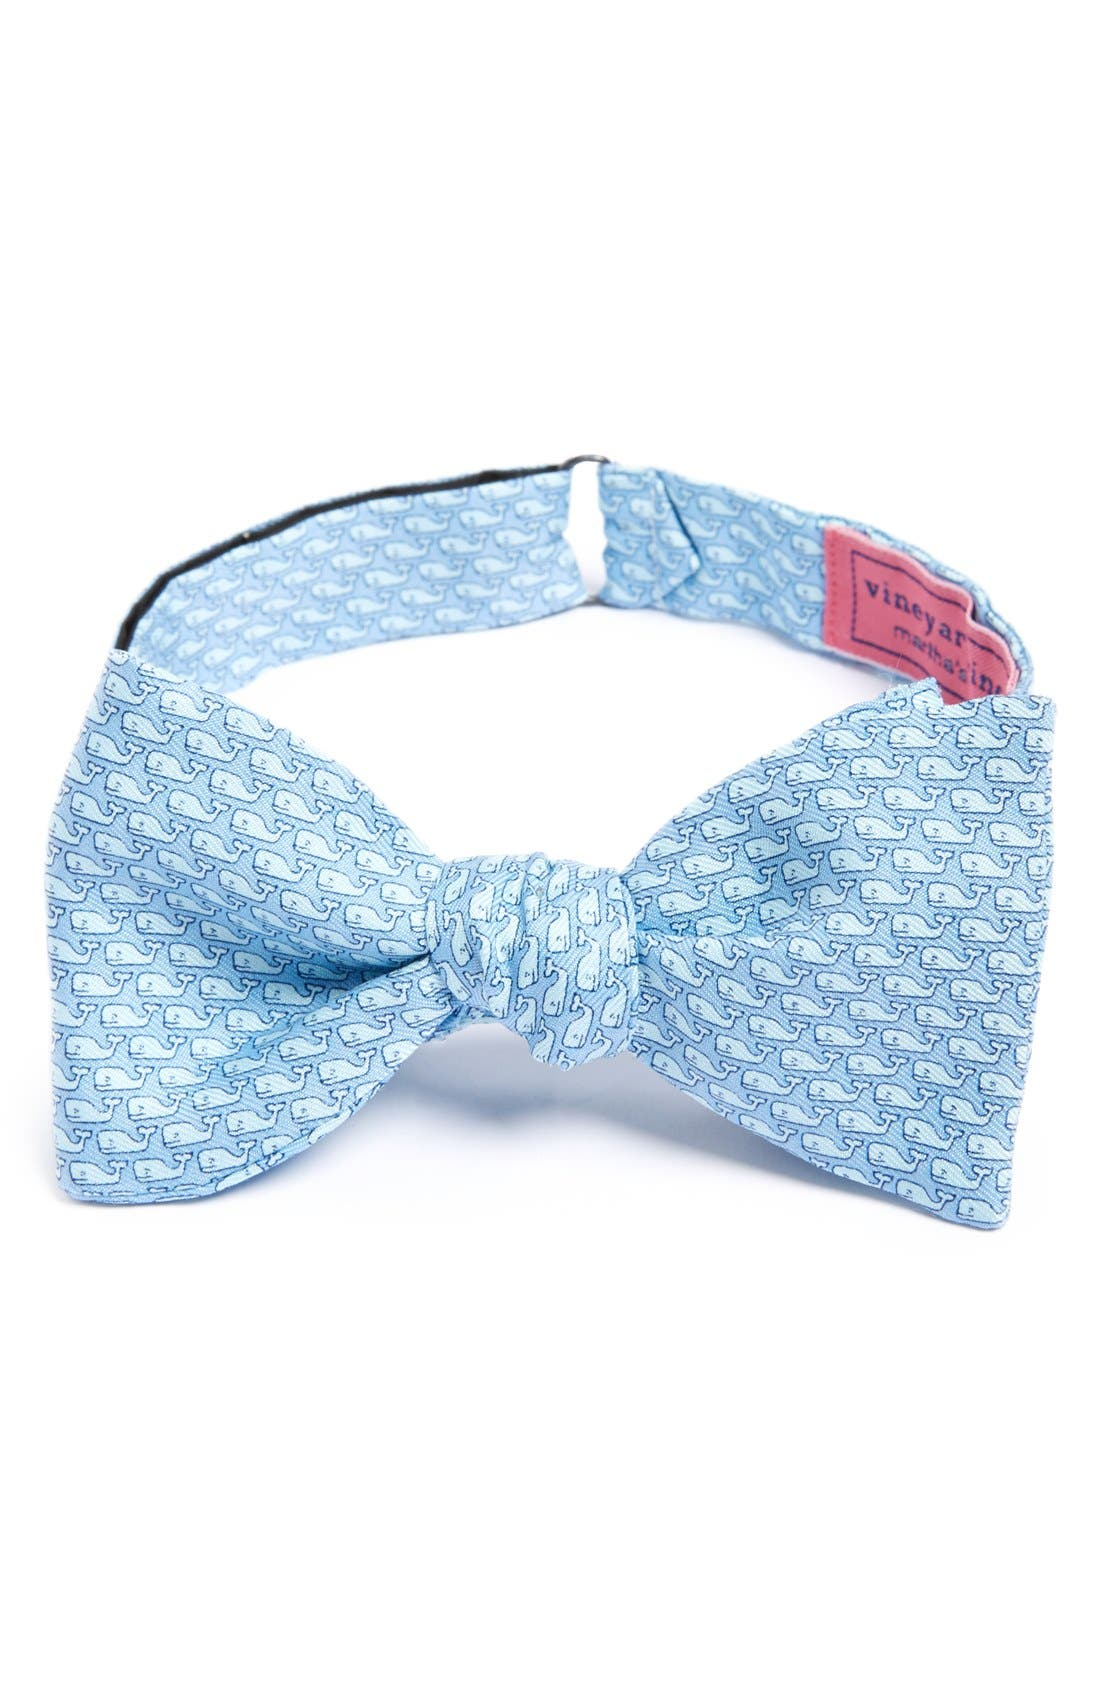 Whale Print Silk Bow Tie,                             Main thumbnail 1, color,                             BLUE